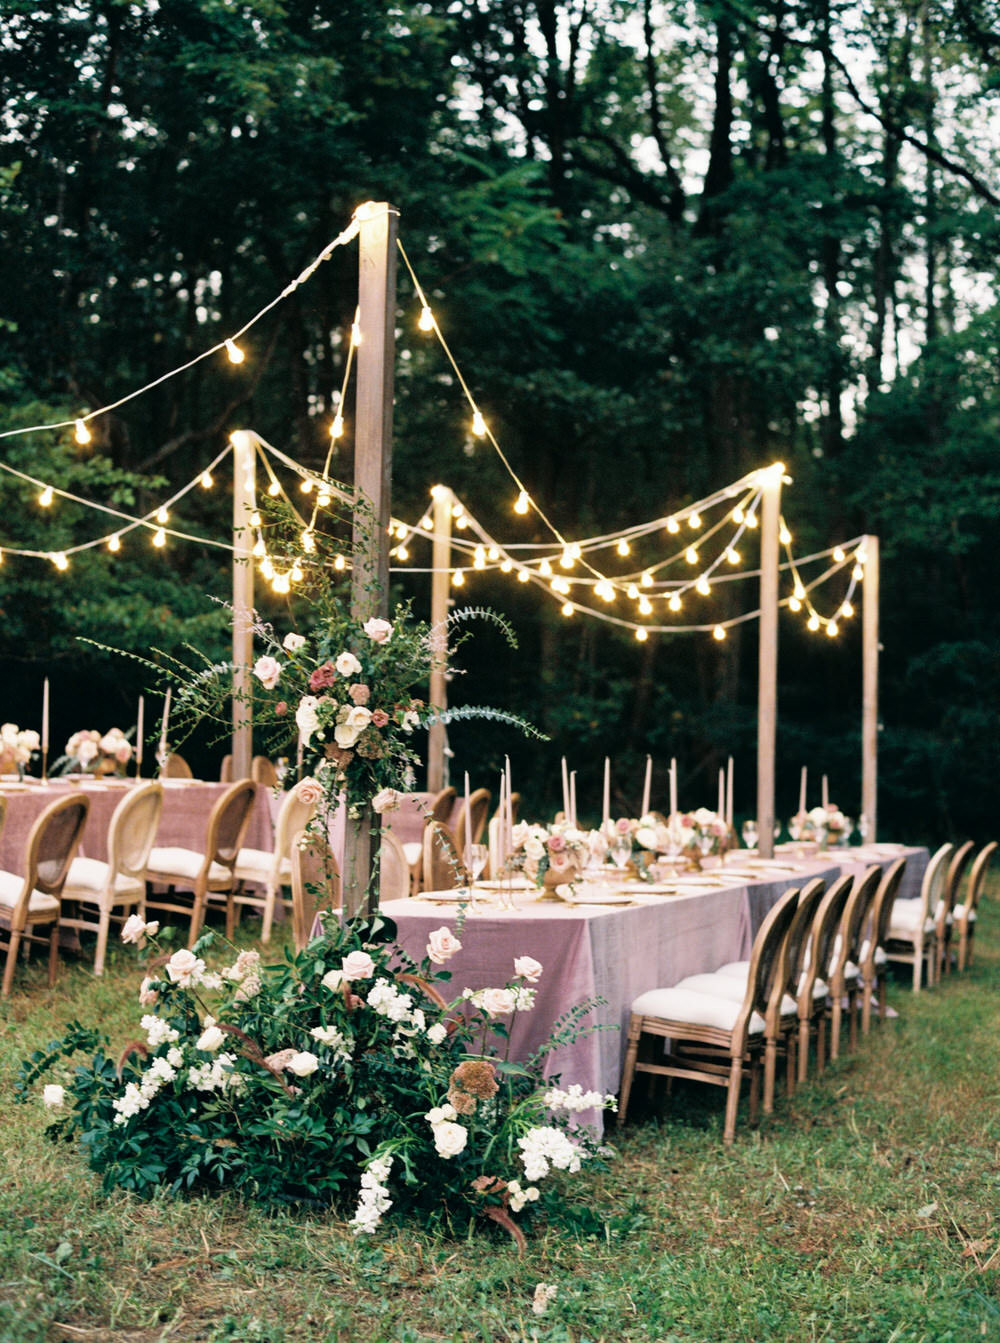 Wedding Lighting Hire Company in London